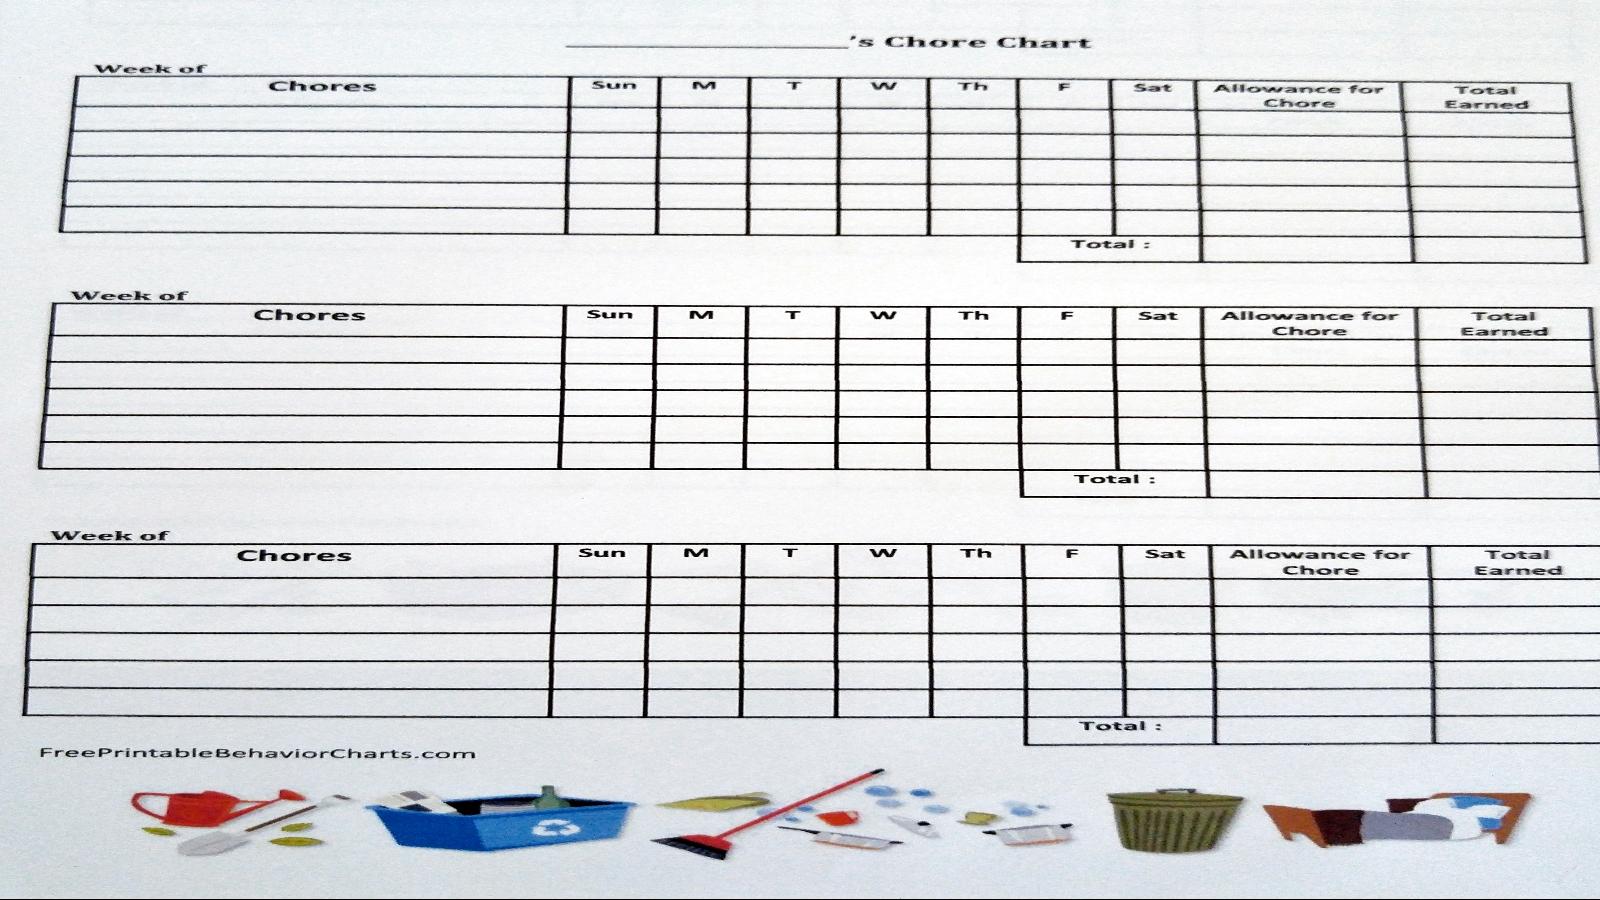 weekly chores chart